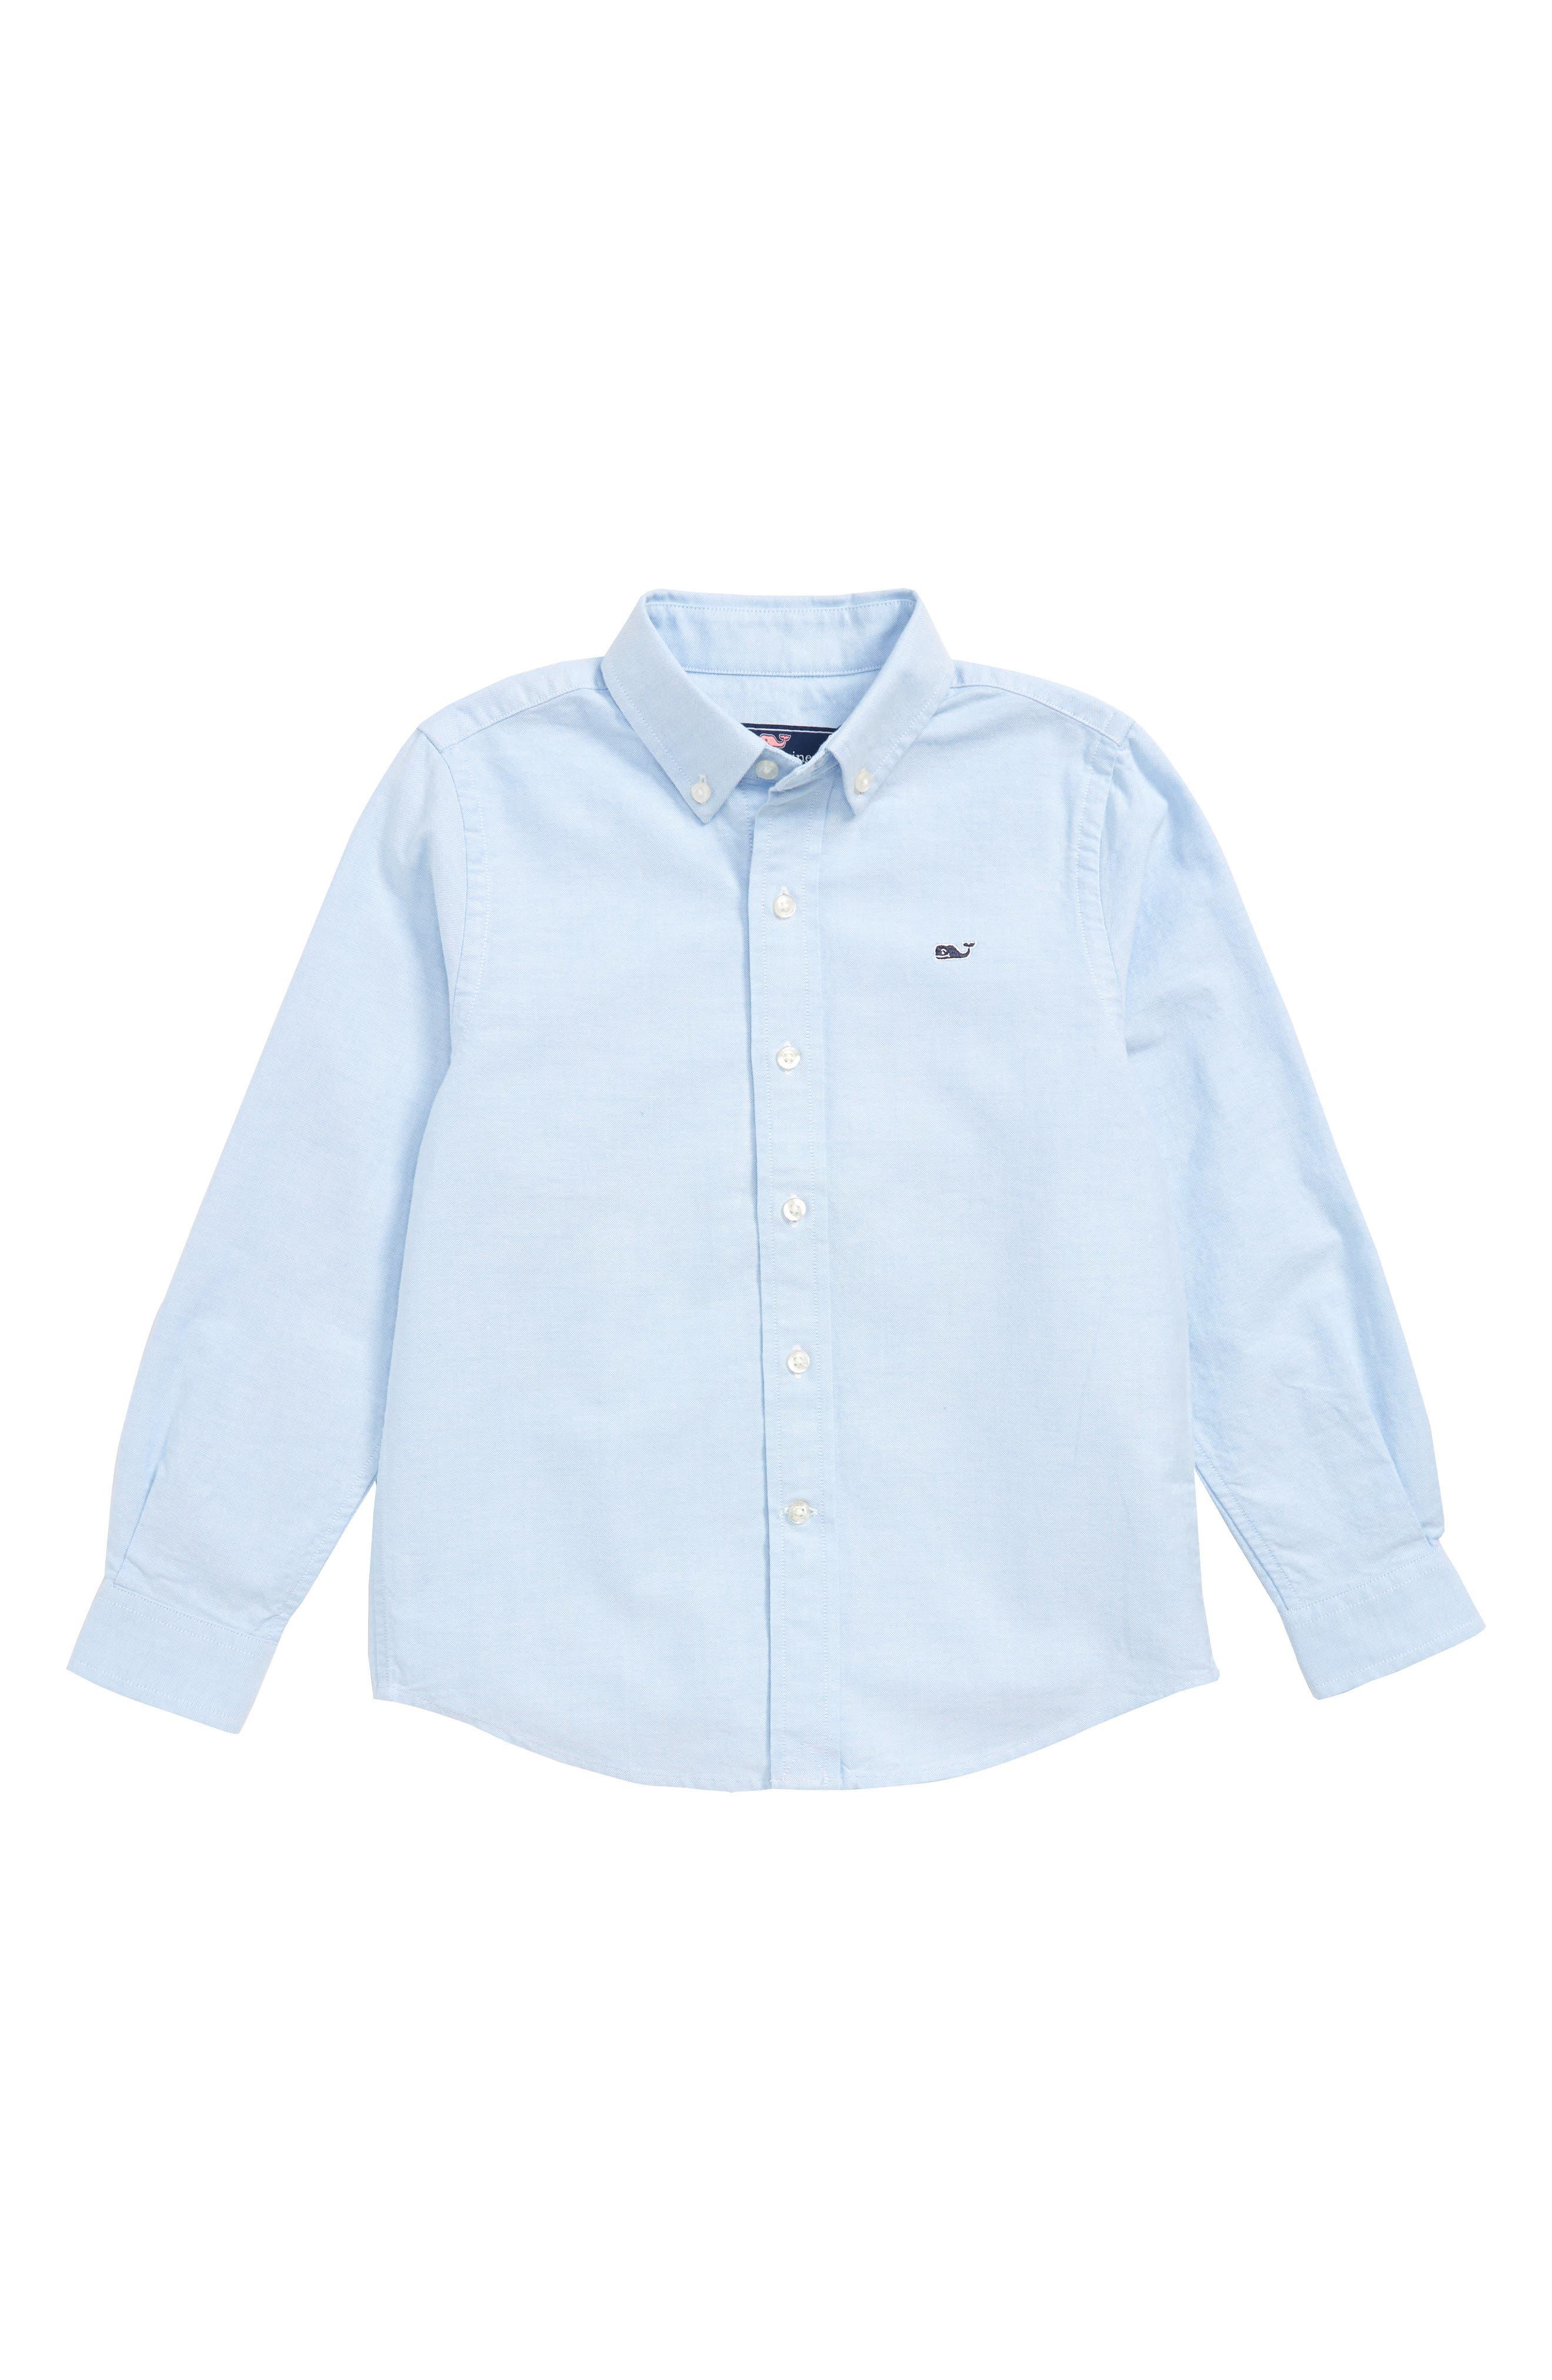 Woven Oxford Shirt,                             Main thumbnail 1, color,                             OCEAN BREEZE